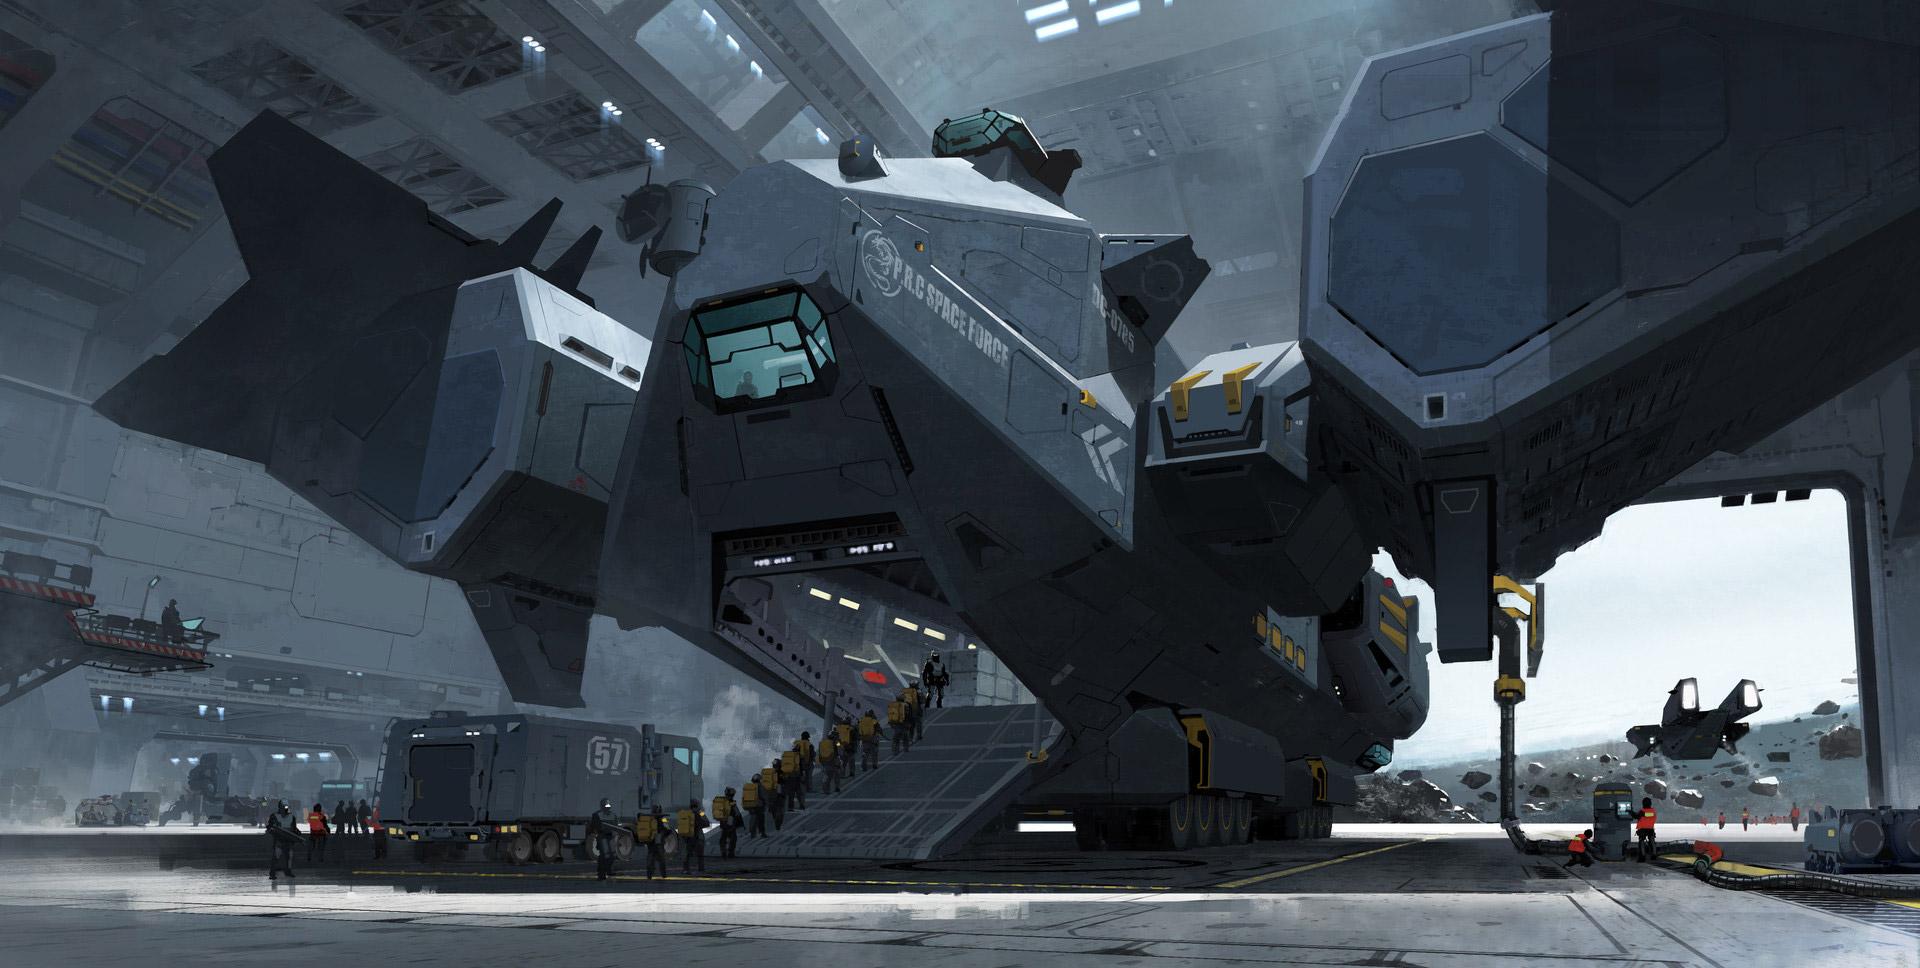 The Futuristic 3d Sci-Fi Art of Yu Yiming